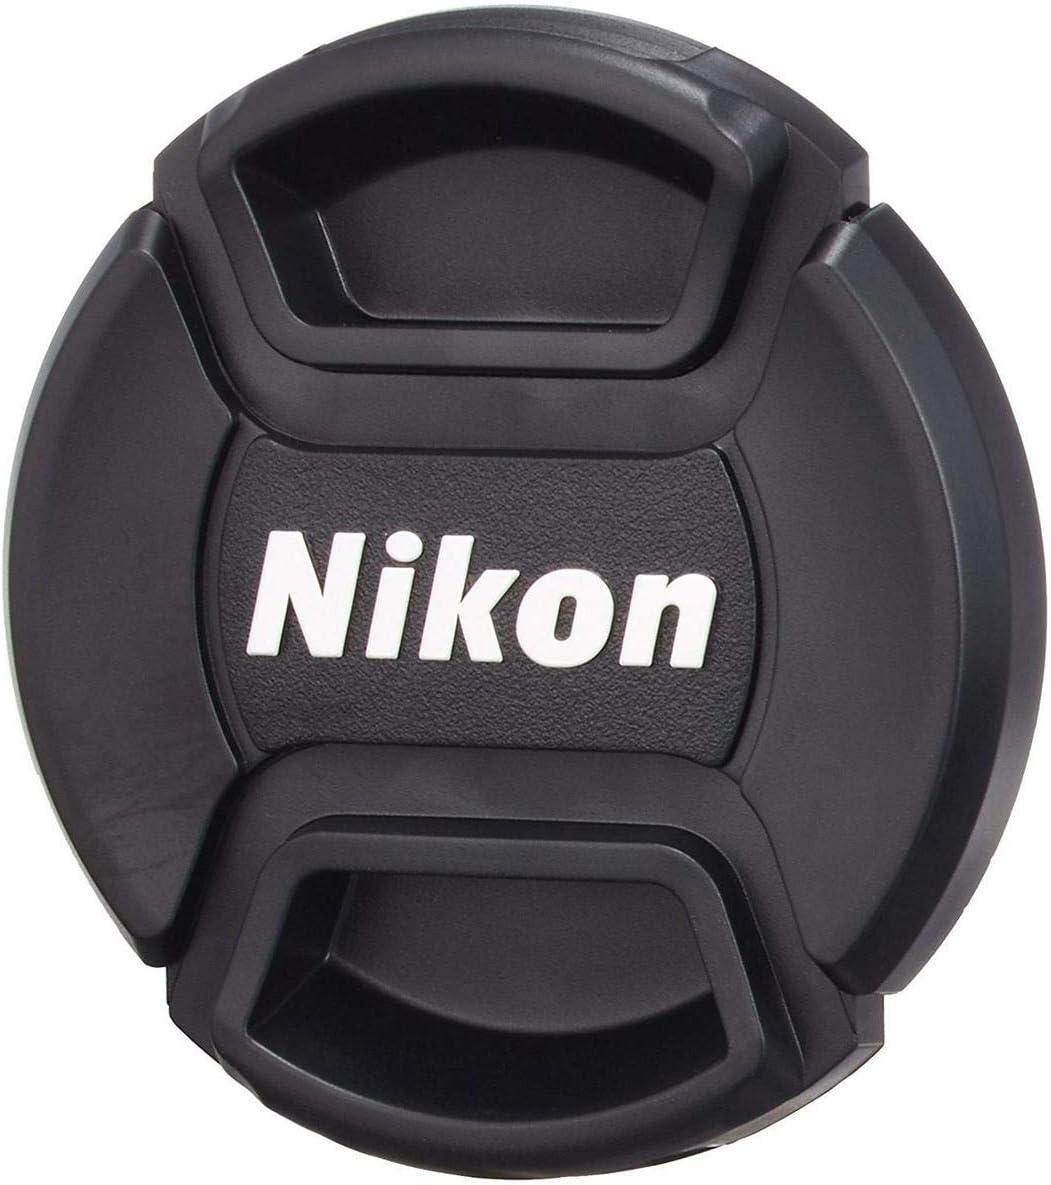 NIKON 578-77 Lens Cap